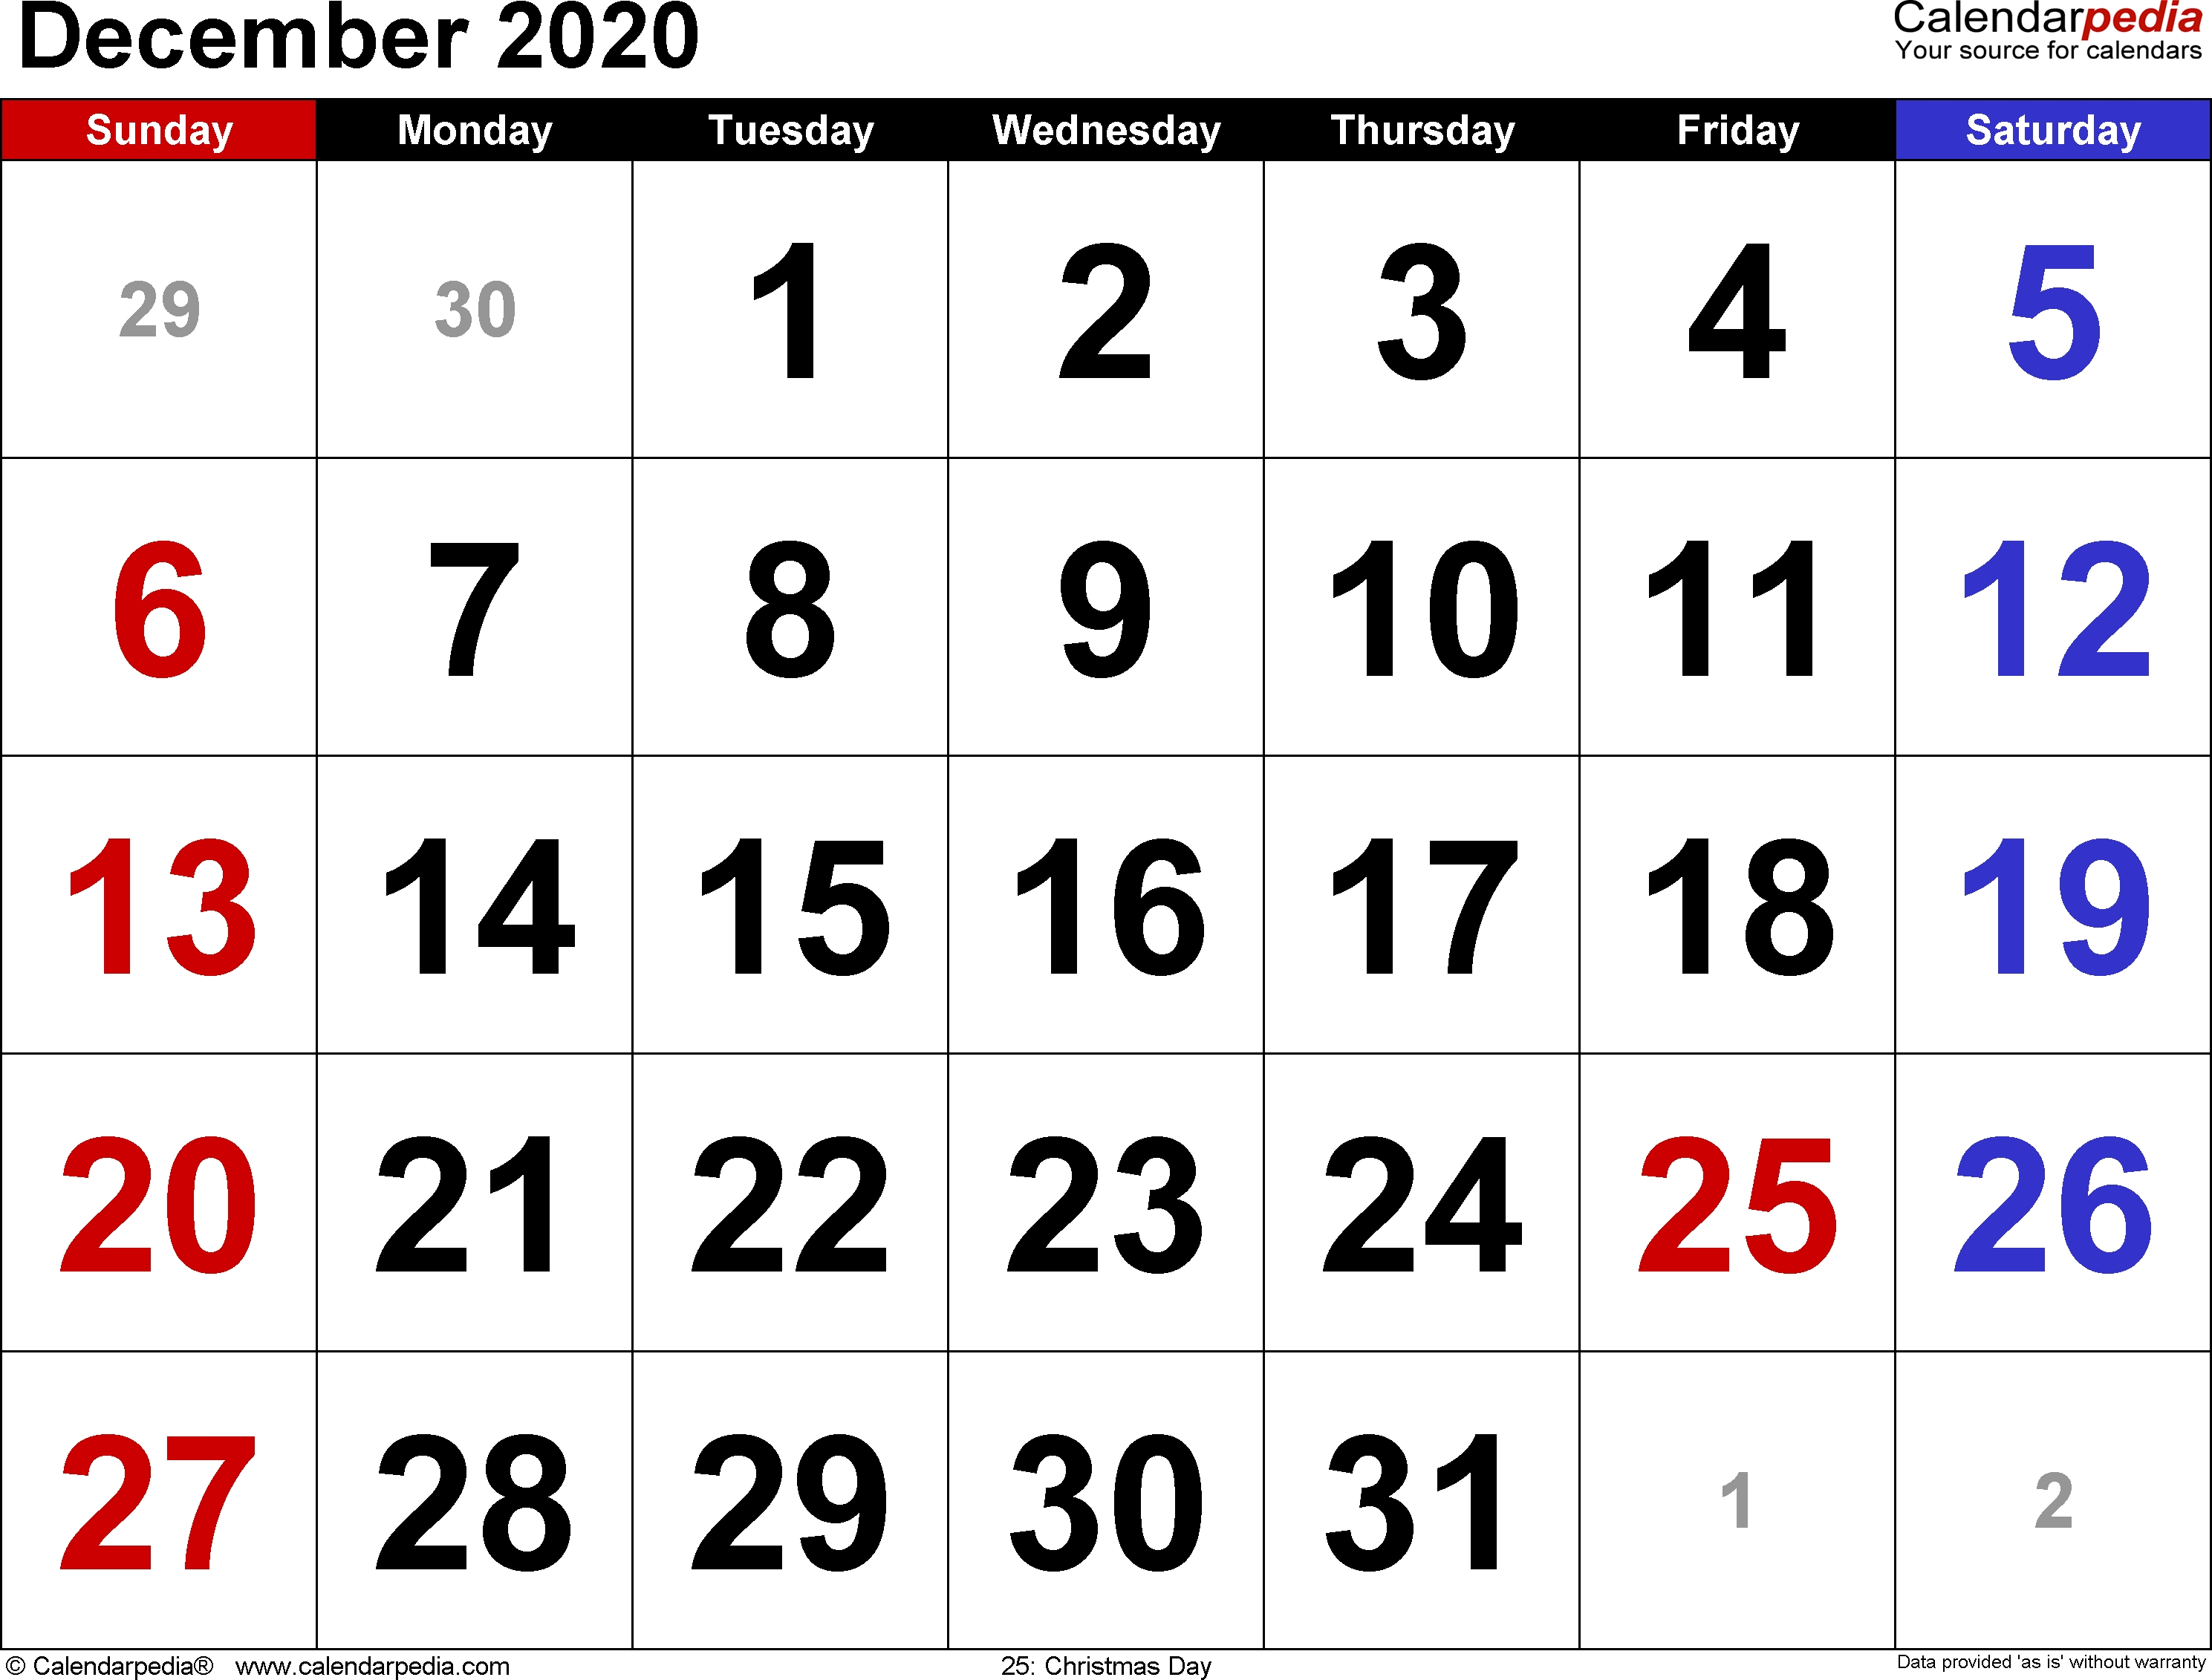 December 2020 Calendars For Word, Excel & Pdf-December 2020 And January 2021 Calendar